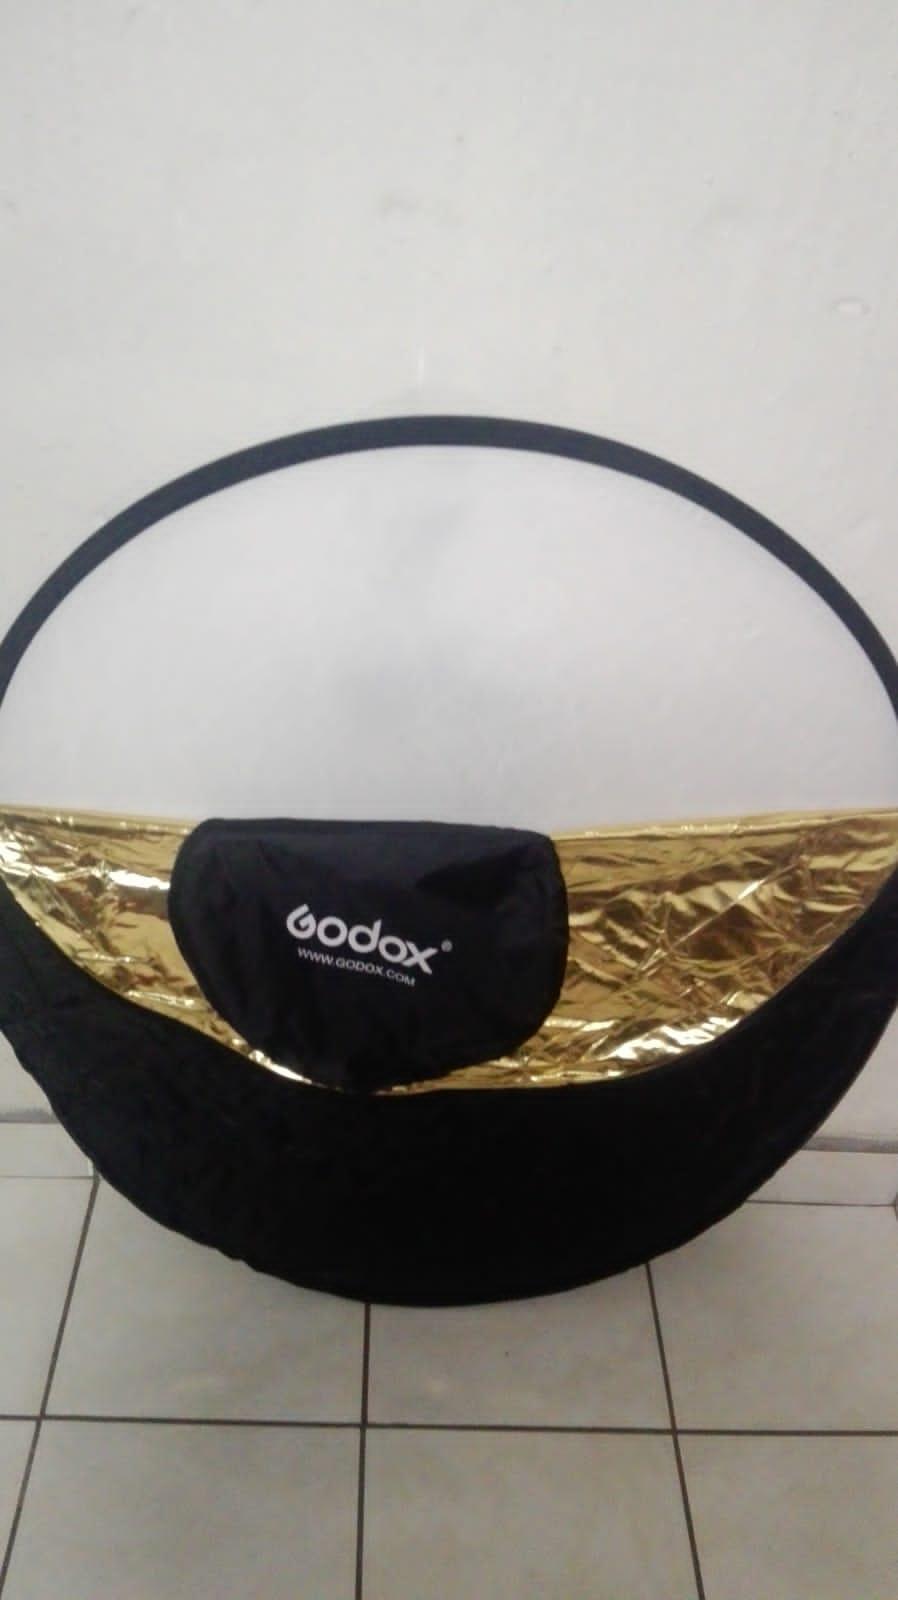 Godox Light Reflector